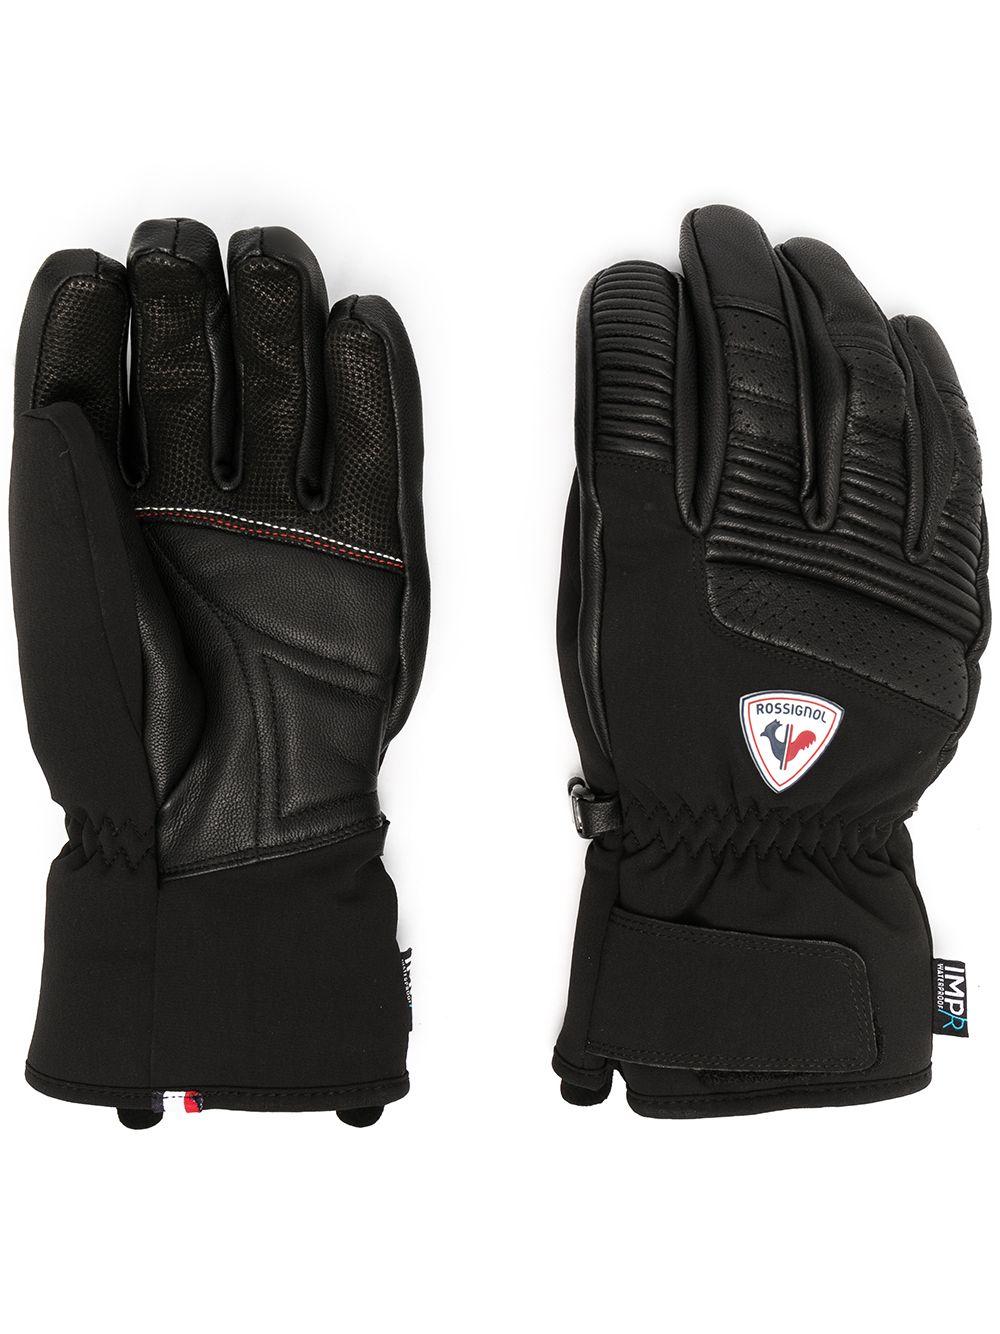 Rossignol rukavice Concept Lth Impr G black Velikost: M